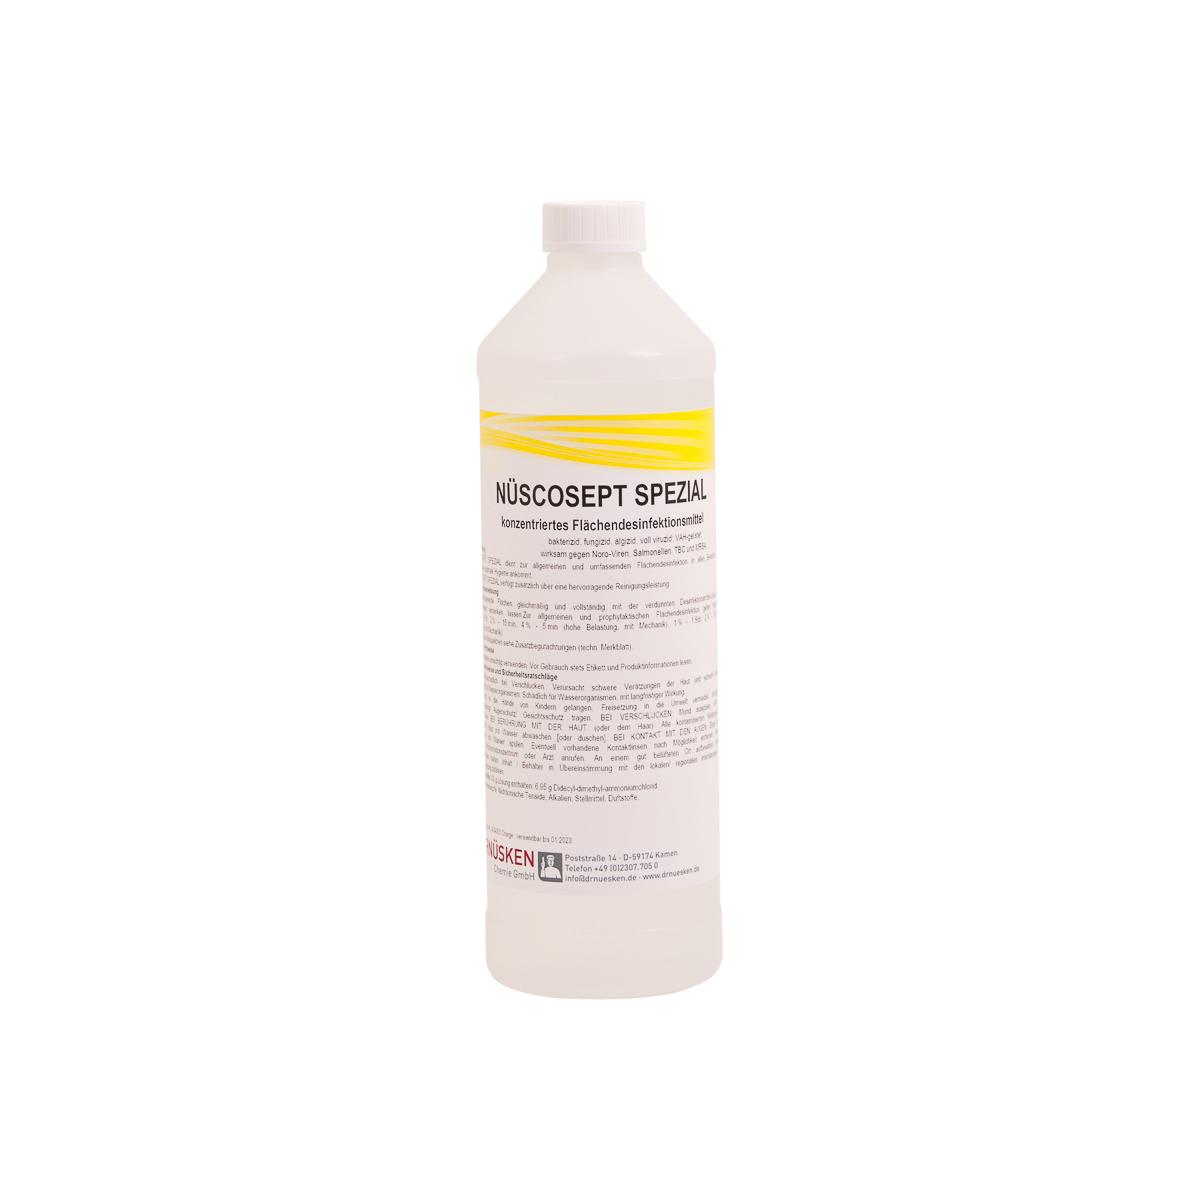 Nüscosept® Spezial Gebrauchsfertig